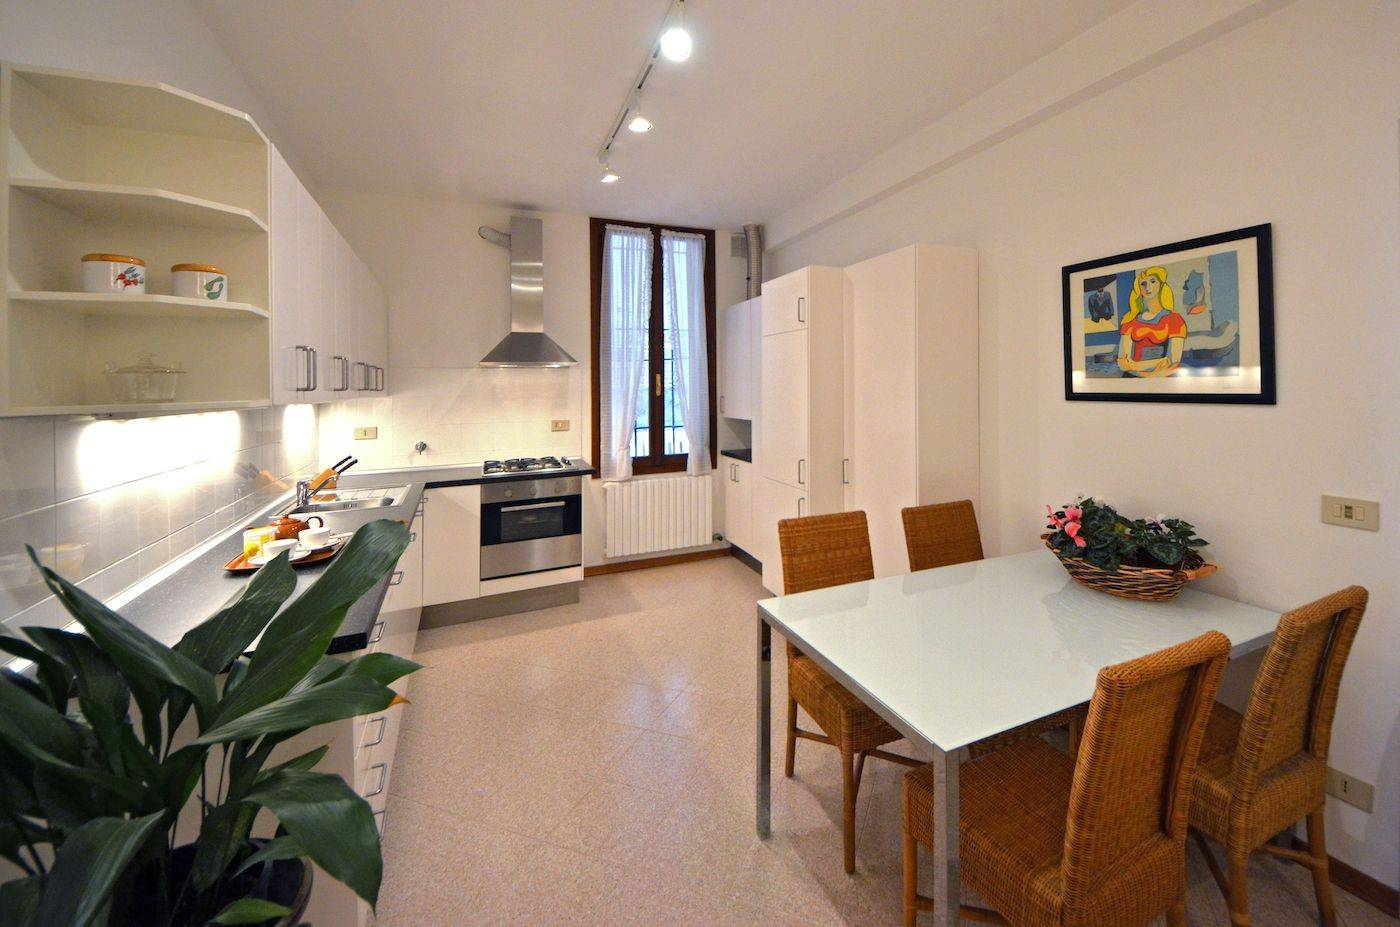 spacious kitchen with brand new appliances